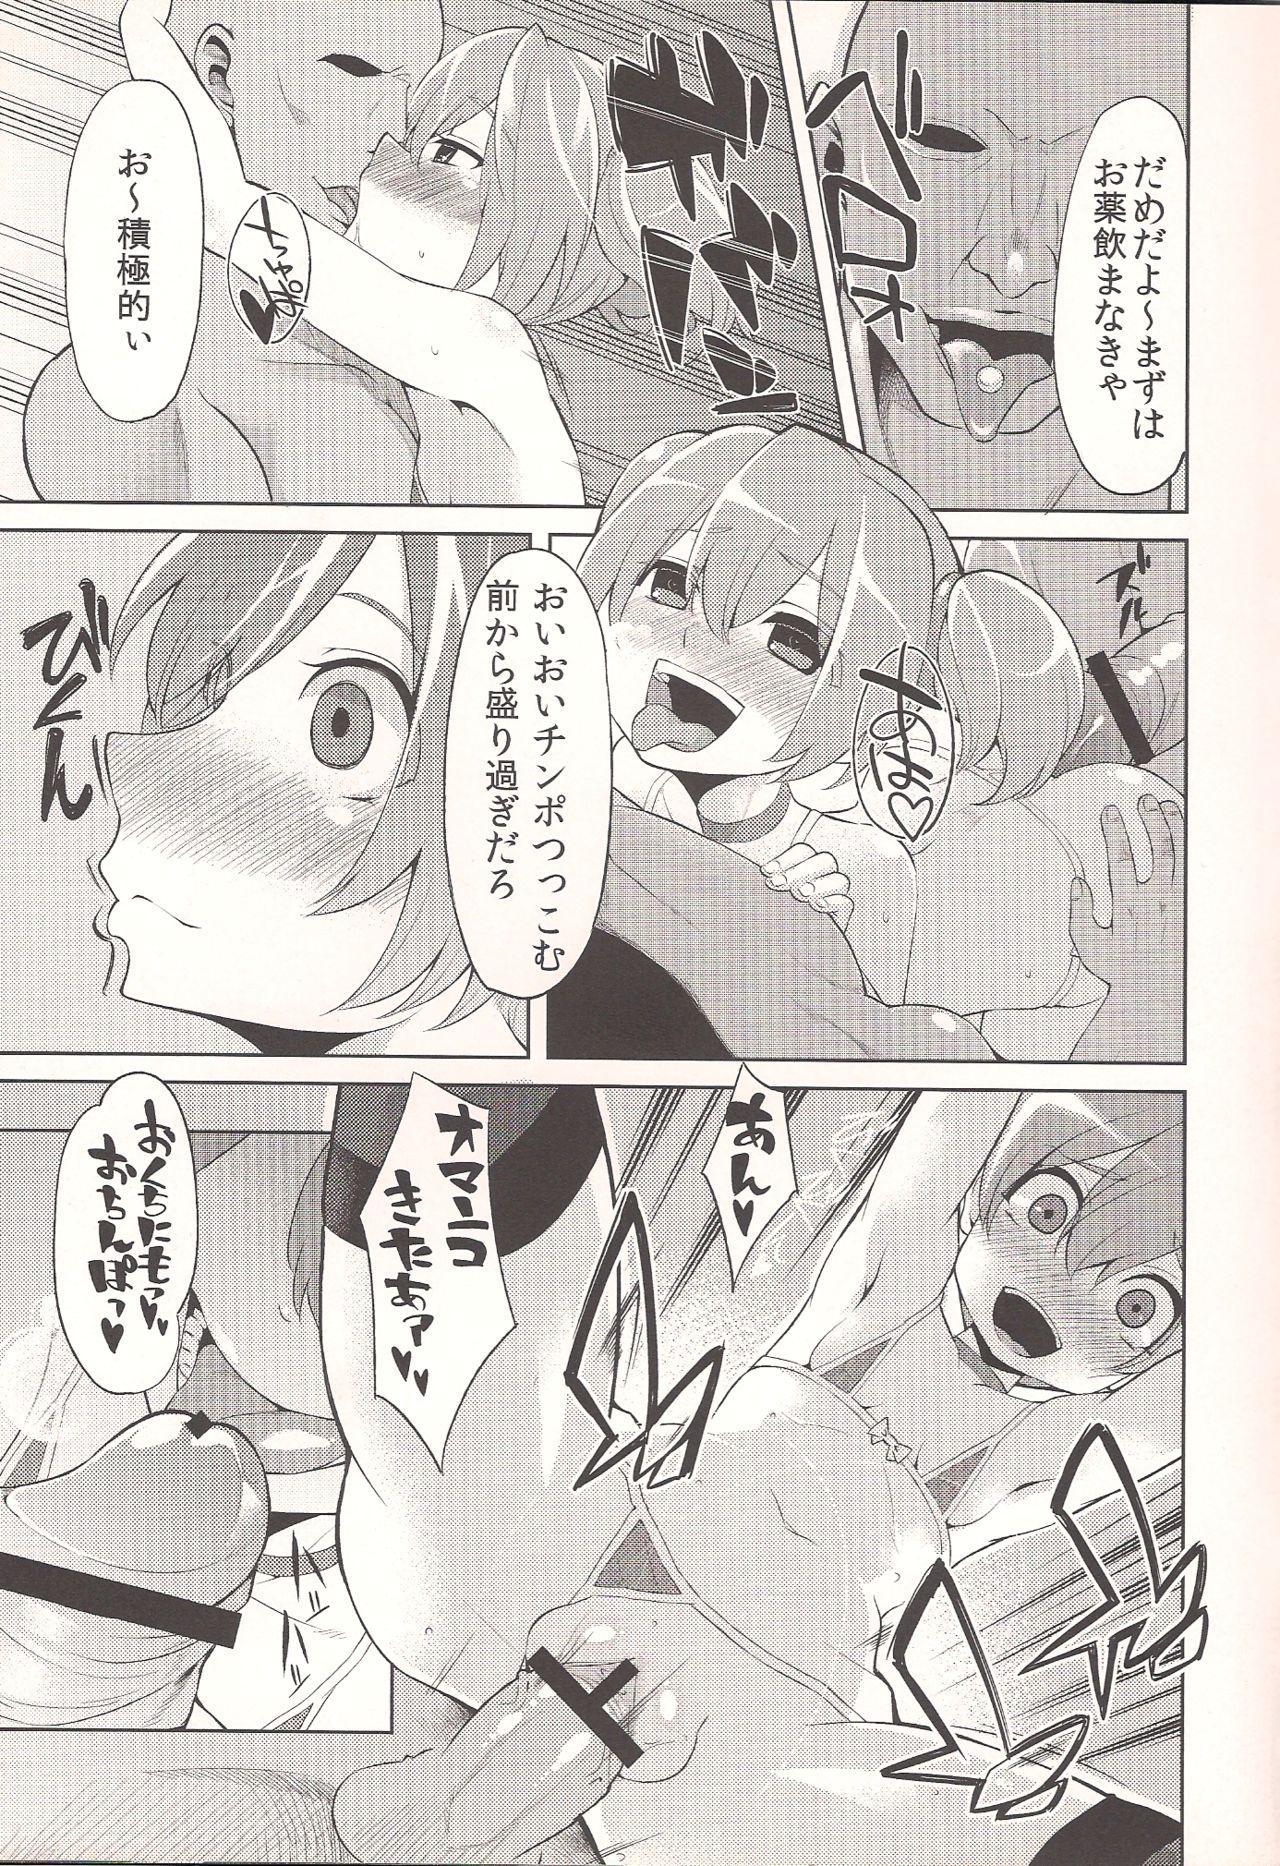 (C83) [Shouwa Saishuu Sensen (Hanauna)] Silica-tan Bibouroku. - My Sweet Silica Memorandum Record (Sword Art Online) 20